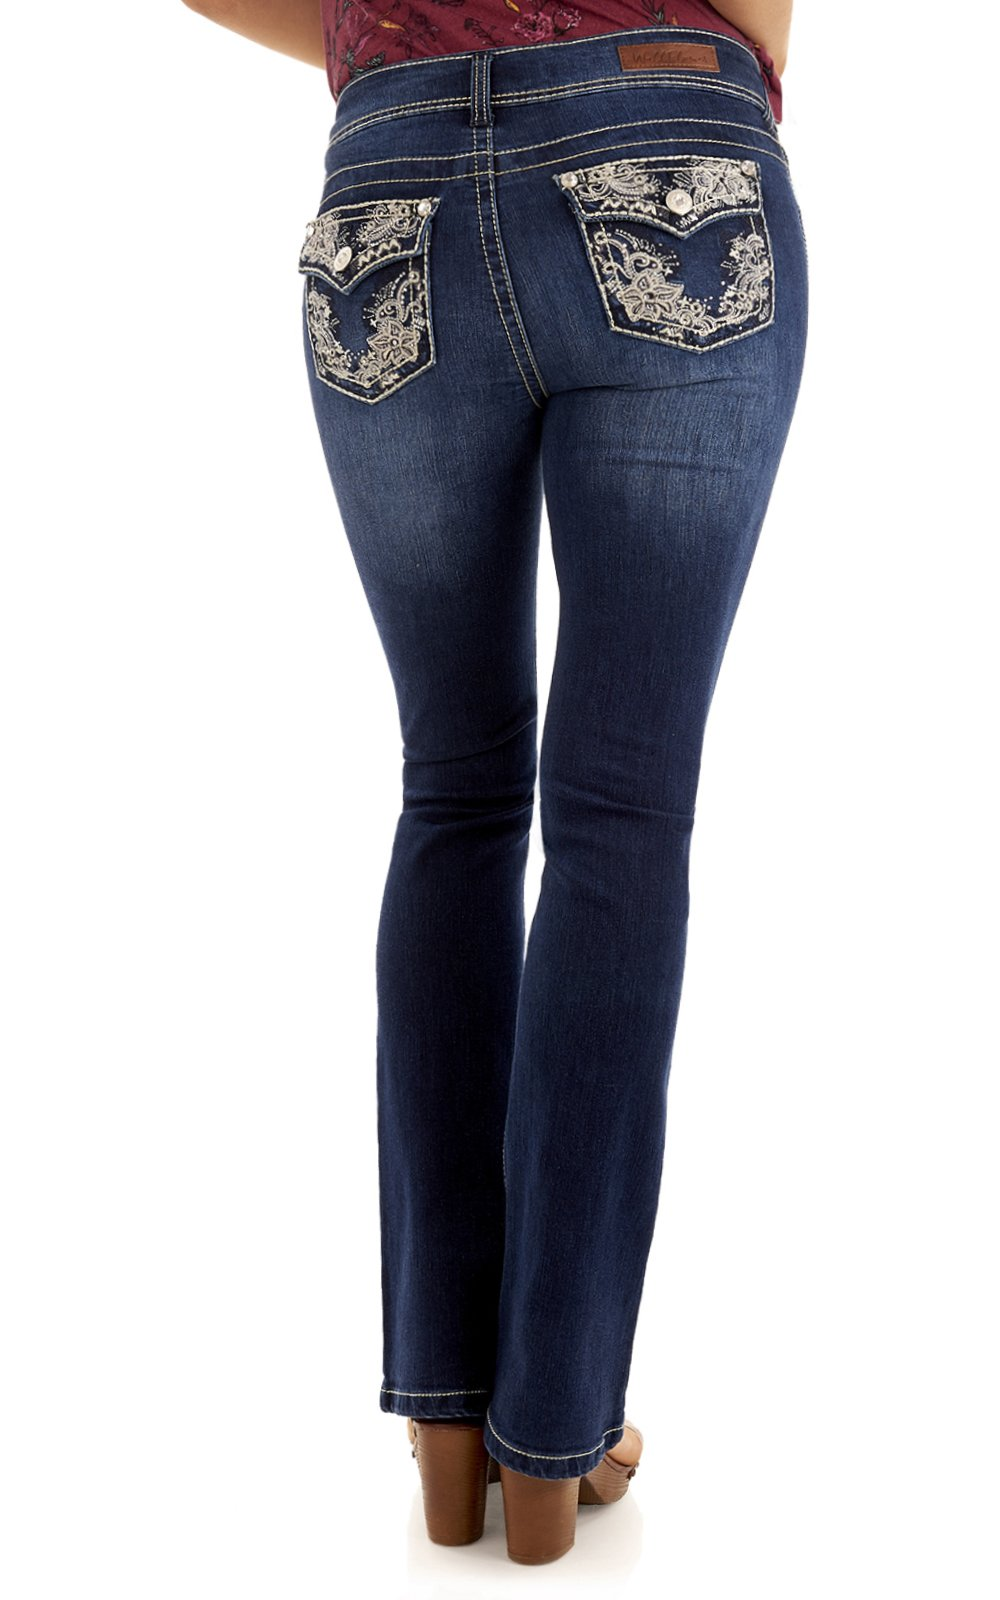 34c2d247b9d Galleon - WallFlower Women's Juniors Luscious Curvy Bling Bootcut Jeans In  Kris, 7